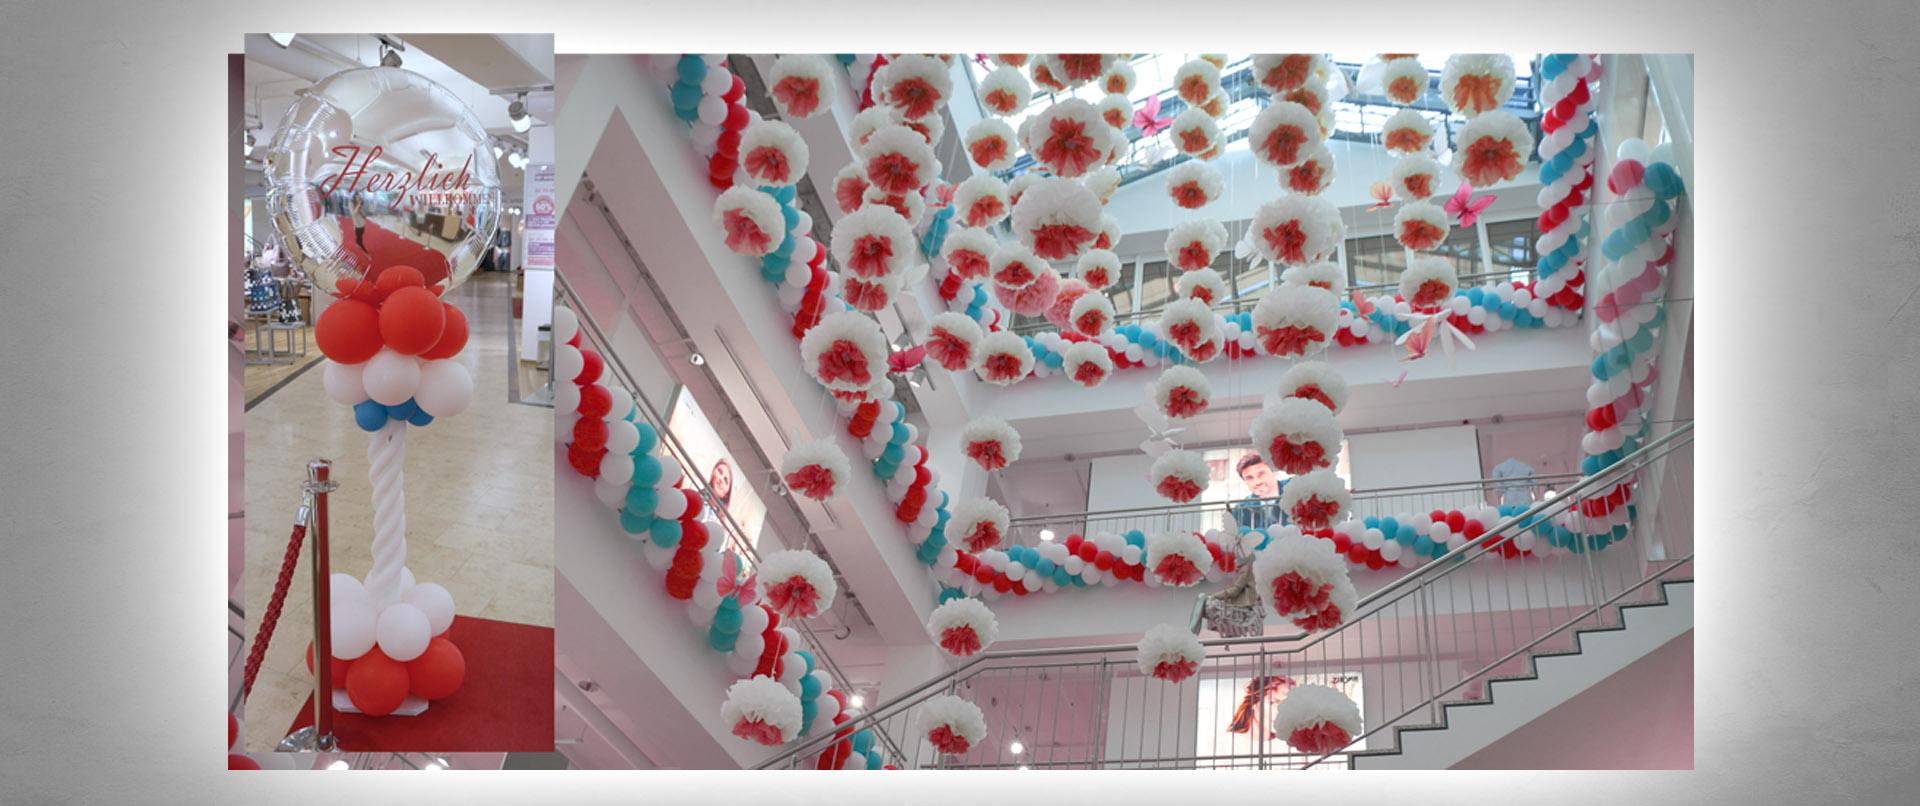 Luftballon-Dekoration Eröffnung Zeller Bock Modehaus Gebrüder Götz Würzburg